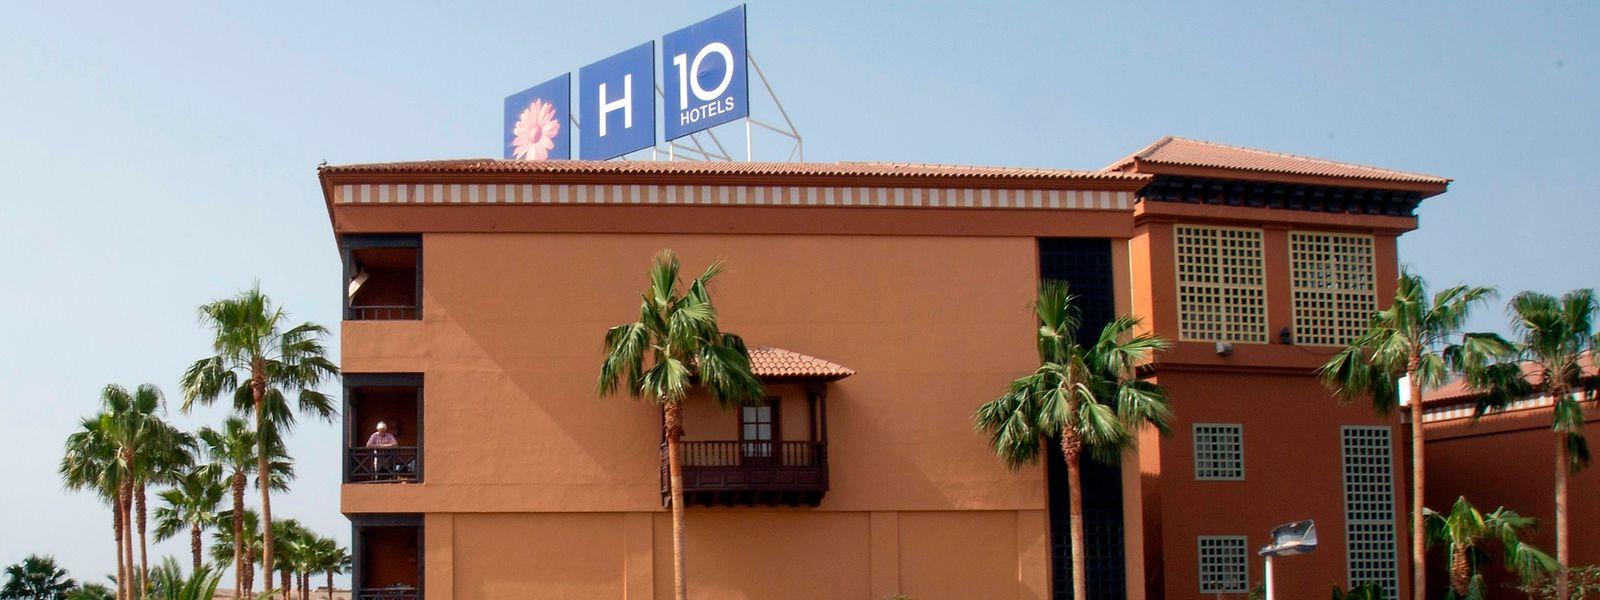 Das Hotel H10 Costa Adeje Palace in La Caleta ist derzeit abgesperrt.